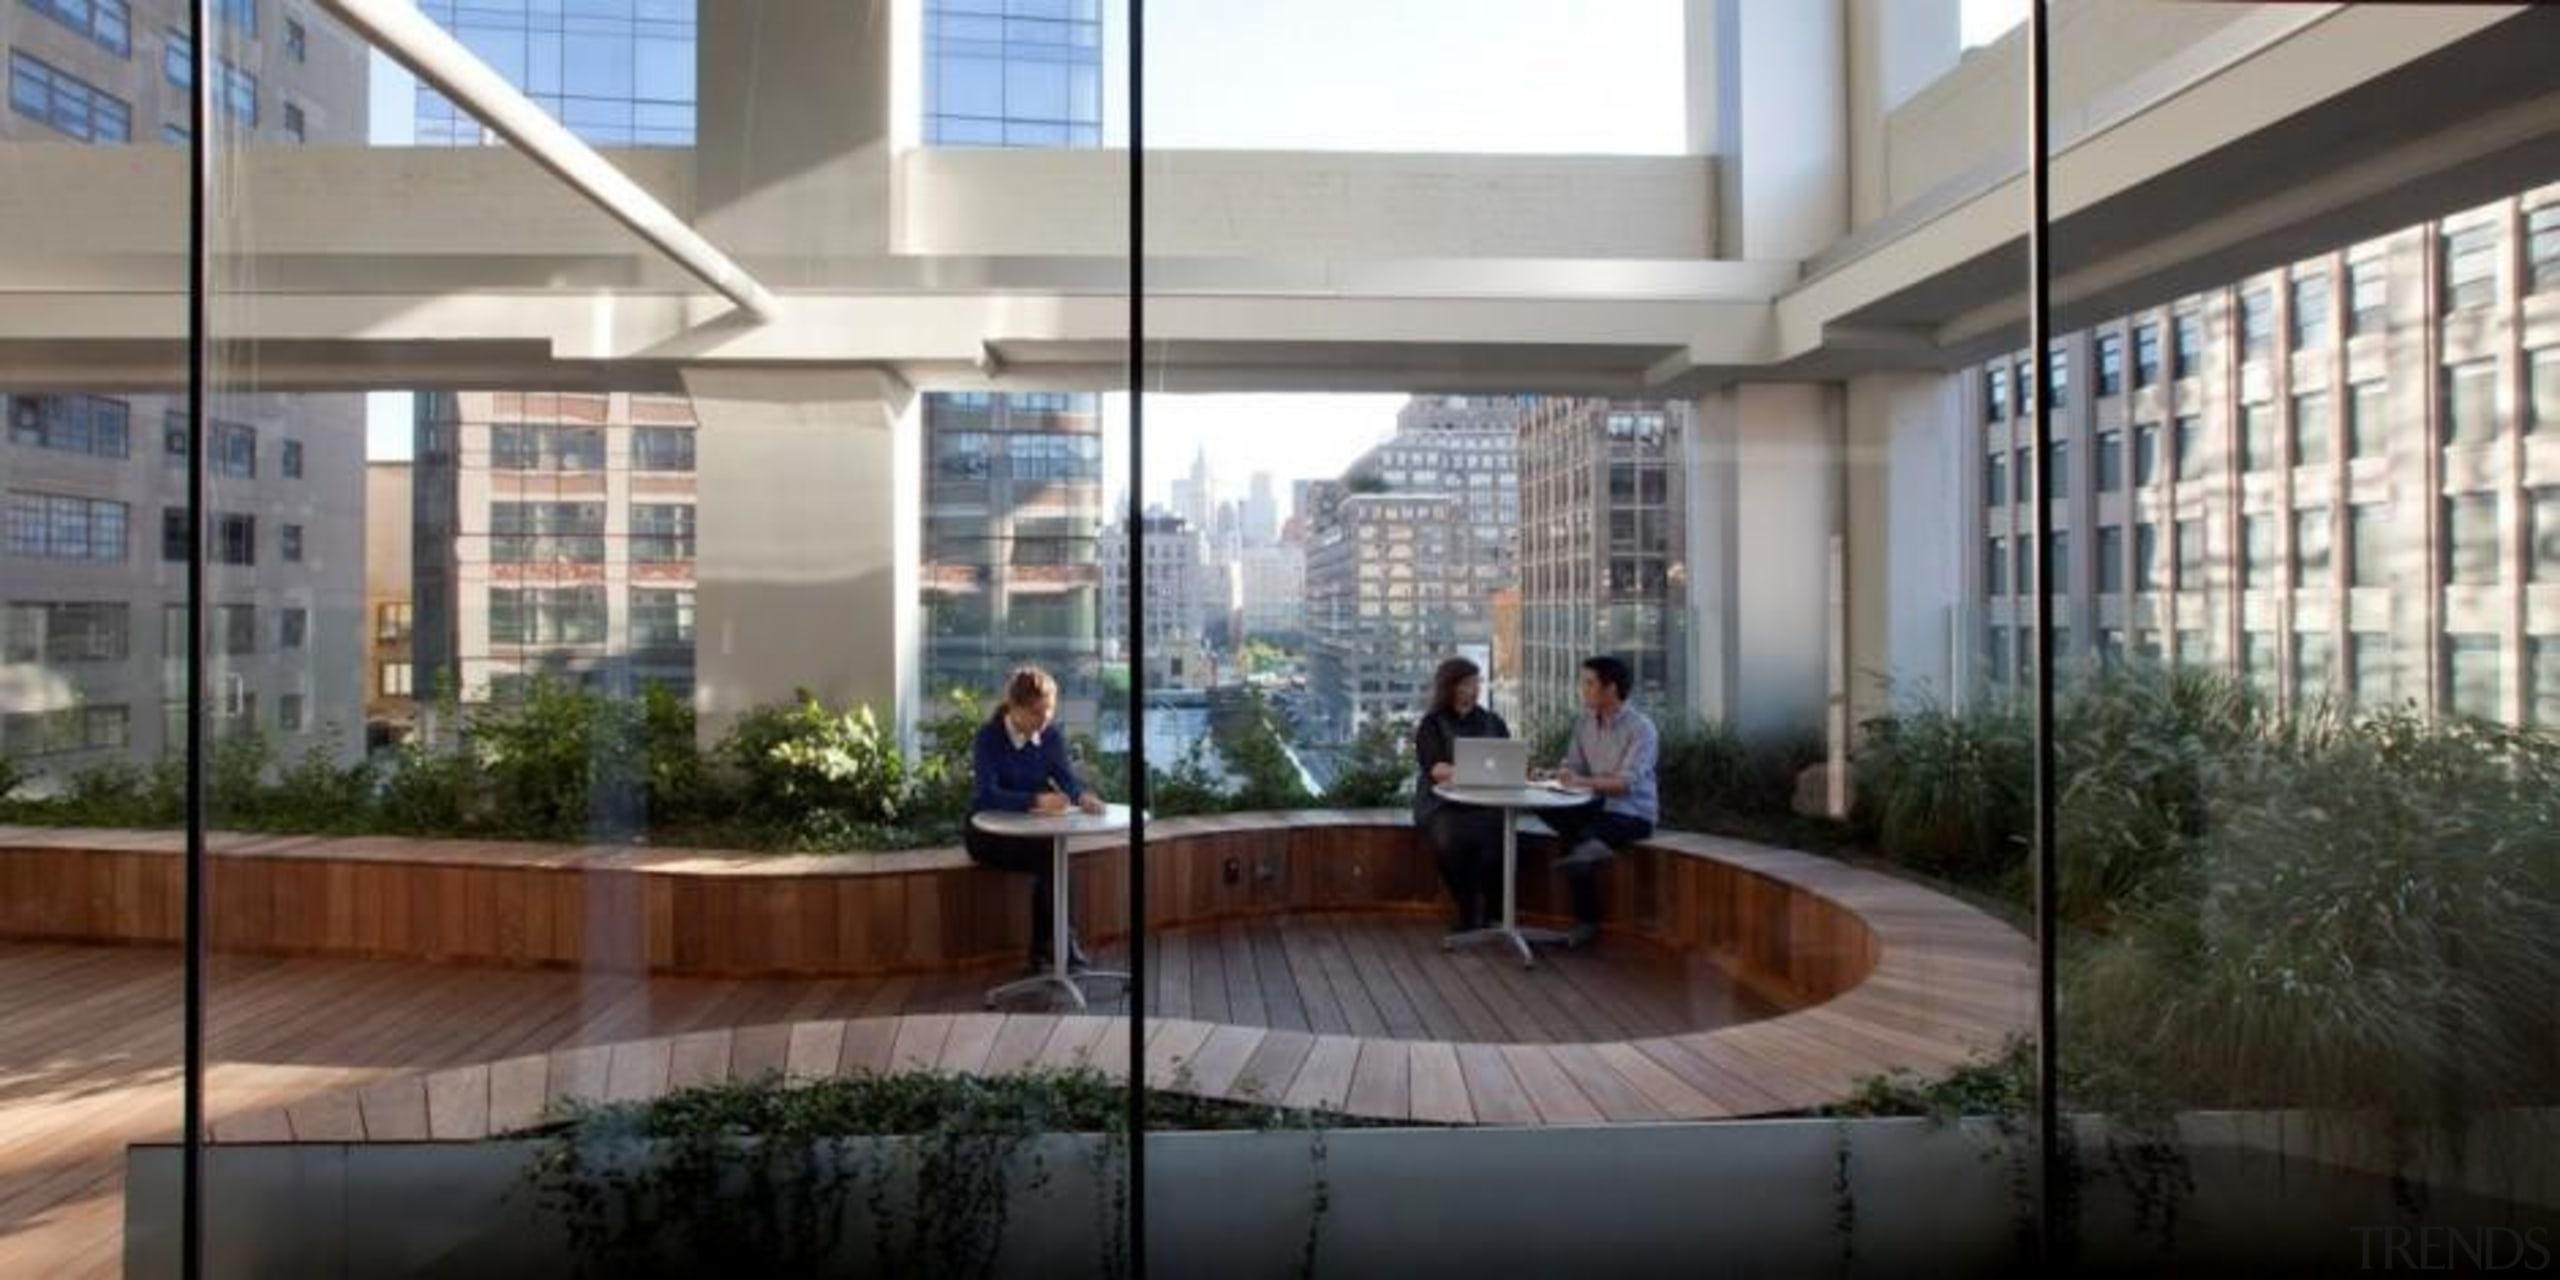 wk12061423940x470.jpg - wk12061423940x470.jpg - apartment   architecture   apartment, architecture, balcony, building, condominium, courtyard, daylighting, house, interior design, lobby, mixed use, property, real estate, window, gray